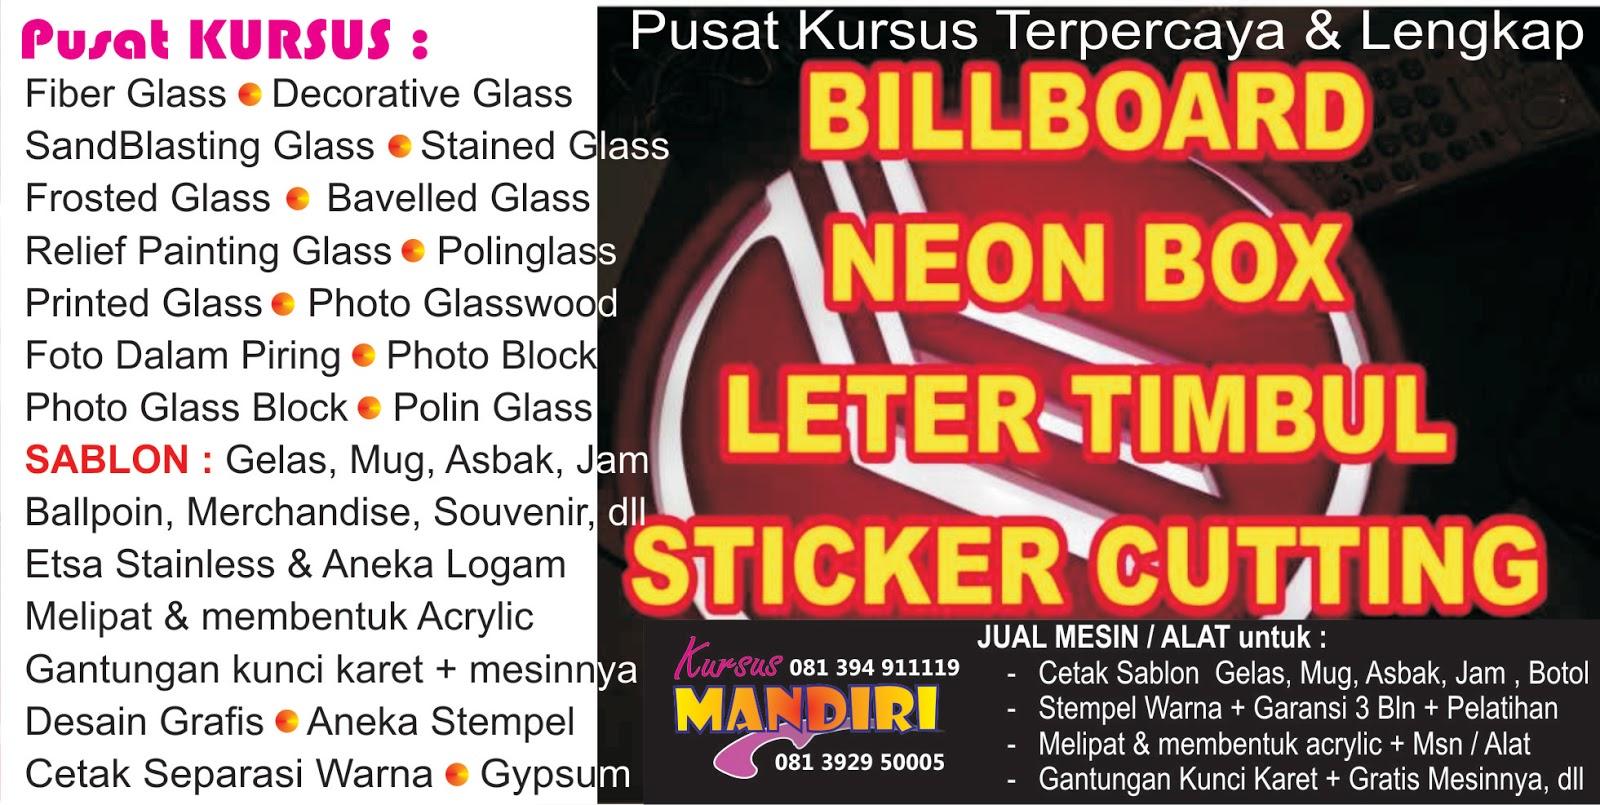 Advertising Merchandise Souvenir Assesoris Variasi